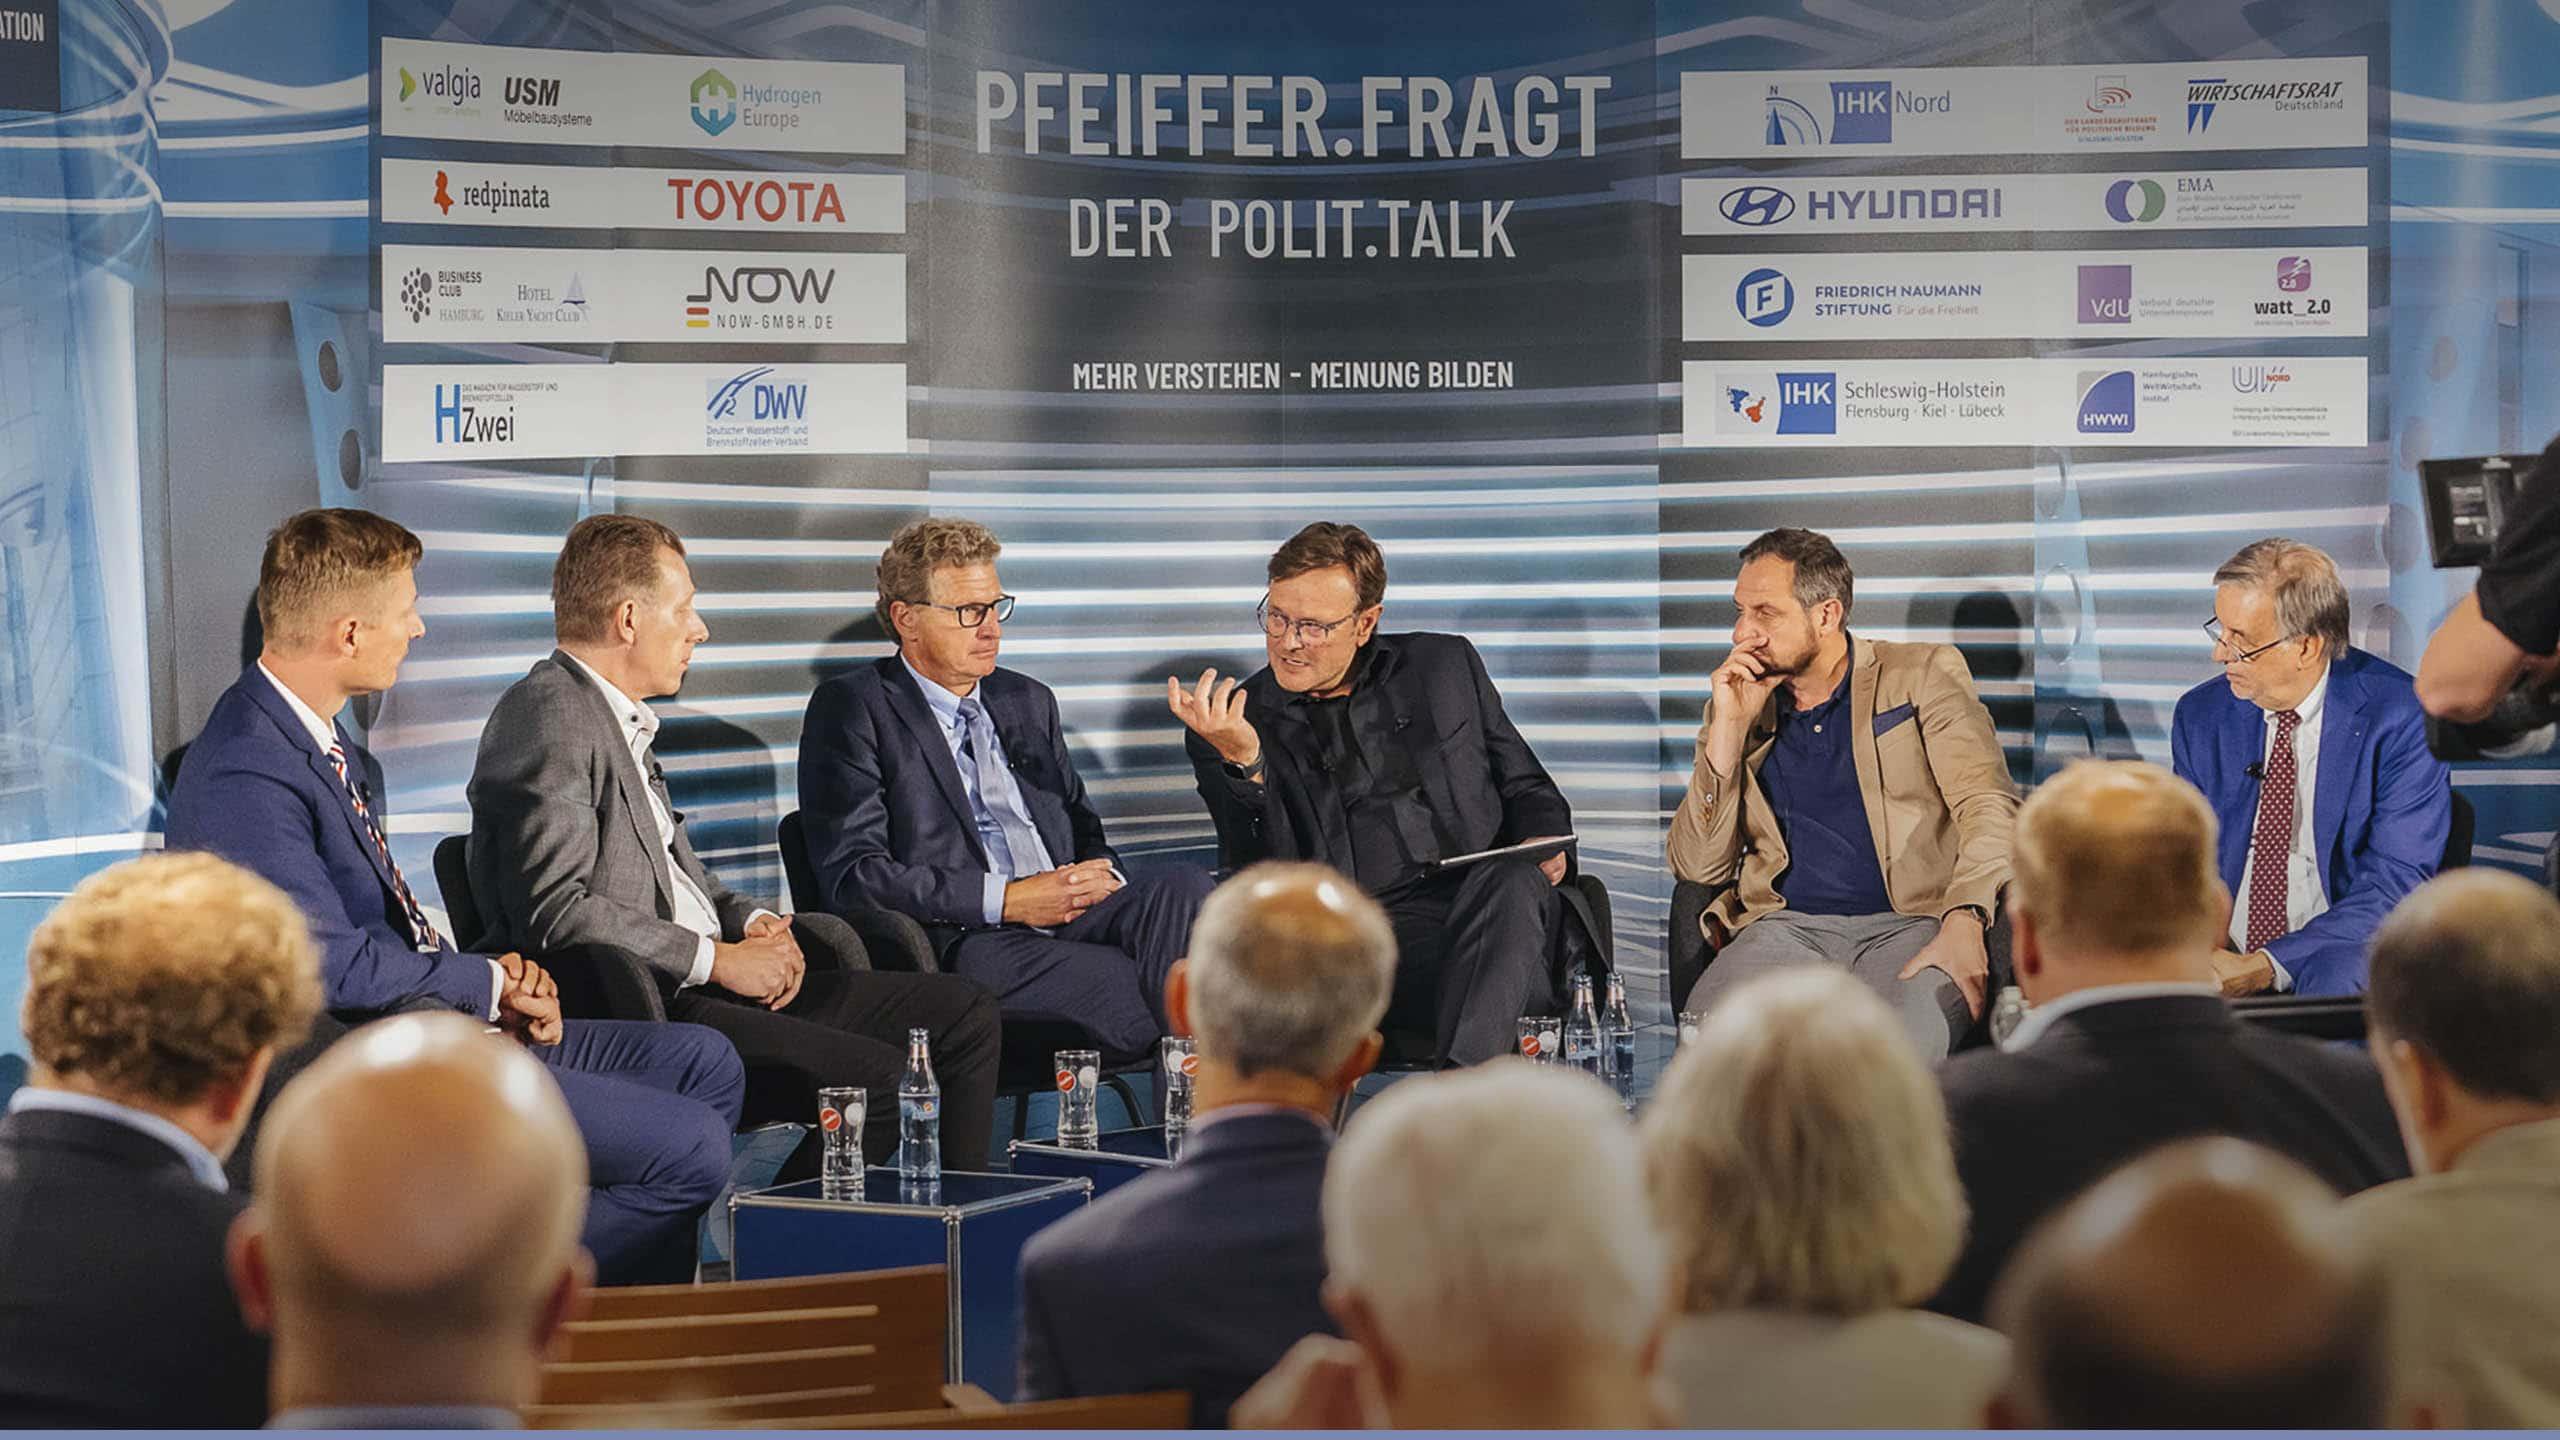 Pfeiffer-fragt-der-polit-talk-kiel-wunderwaffe-wasserstoff-1172019